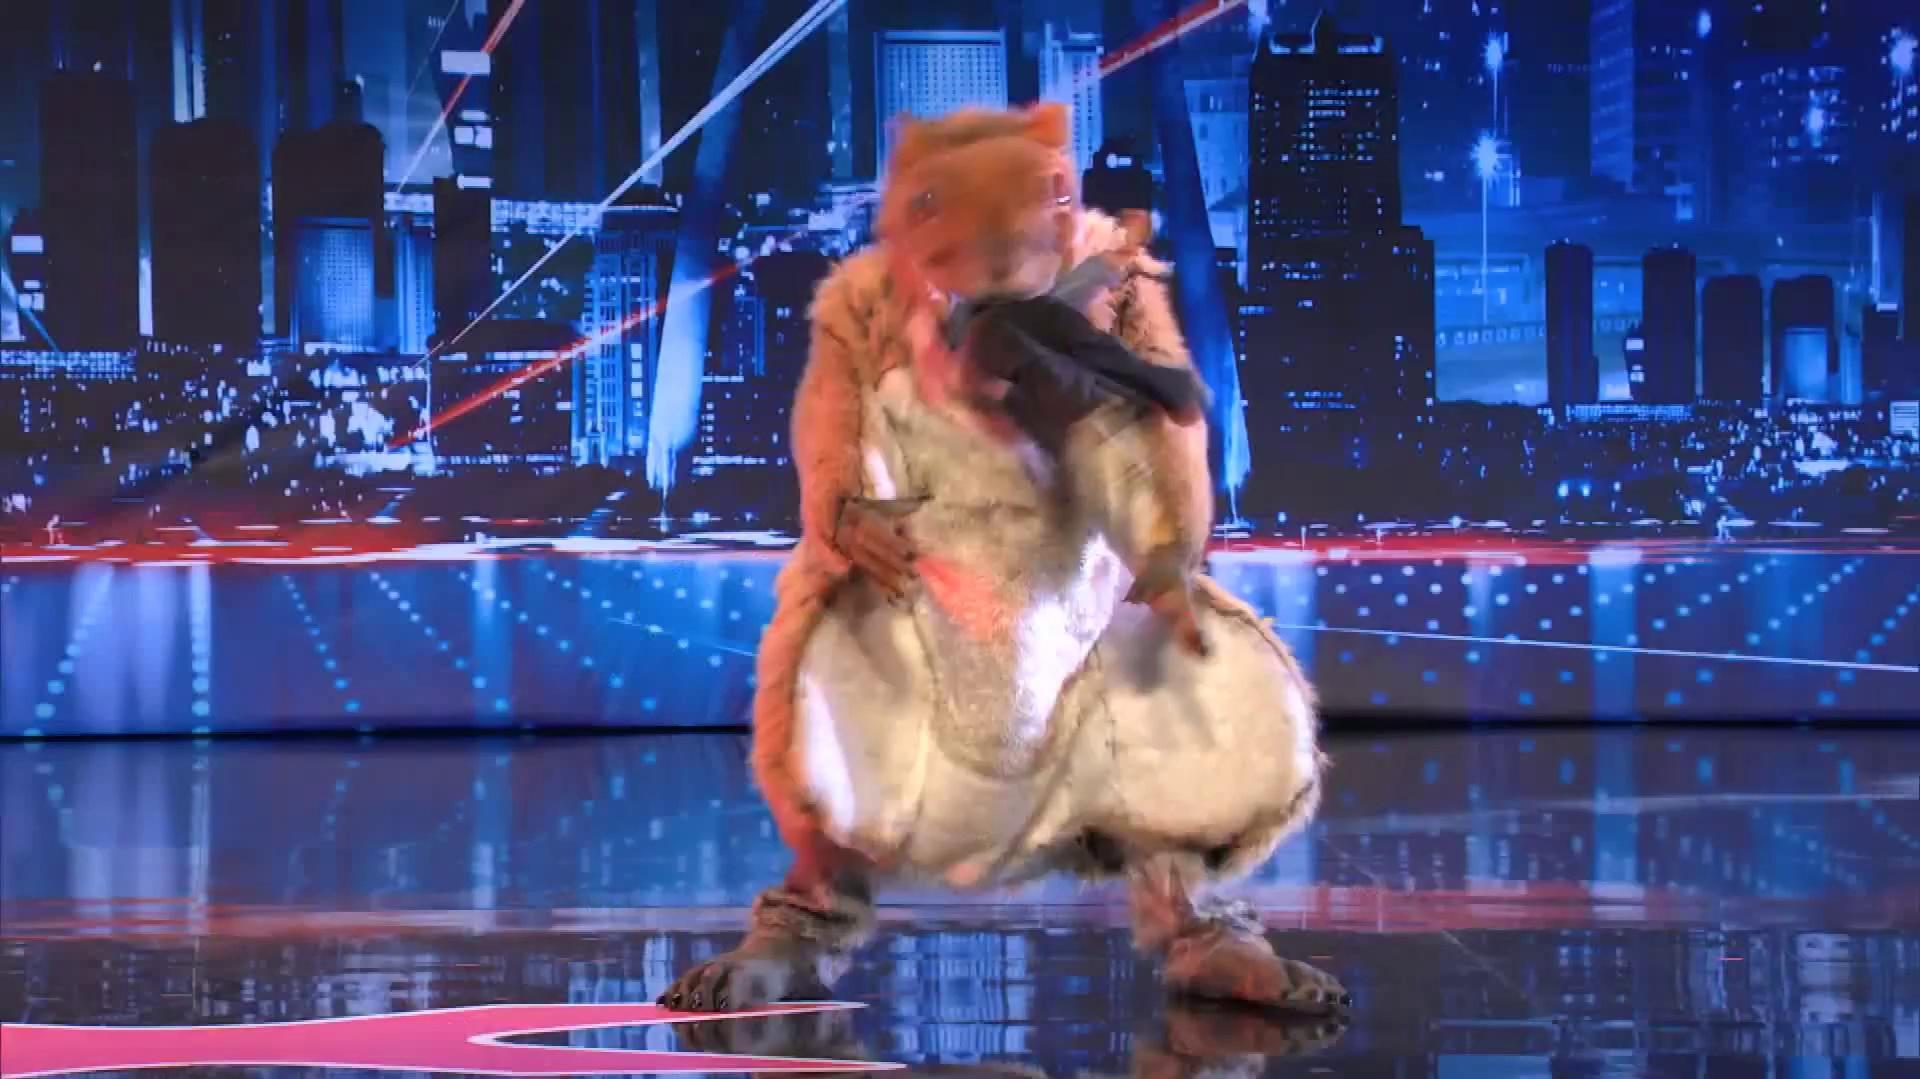 America's Got Talent 2013 - Season 8 - 103 - Johnny Jetpack - Giant Squirrel Swallows a Little Boy